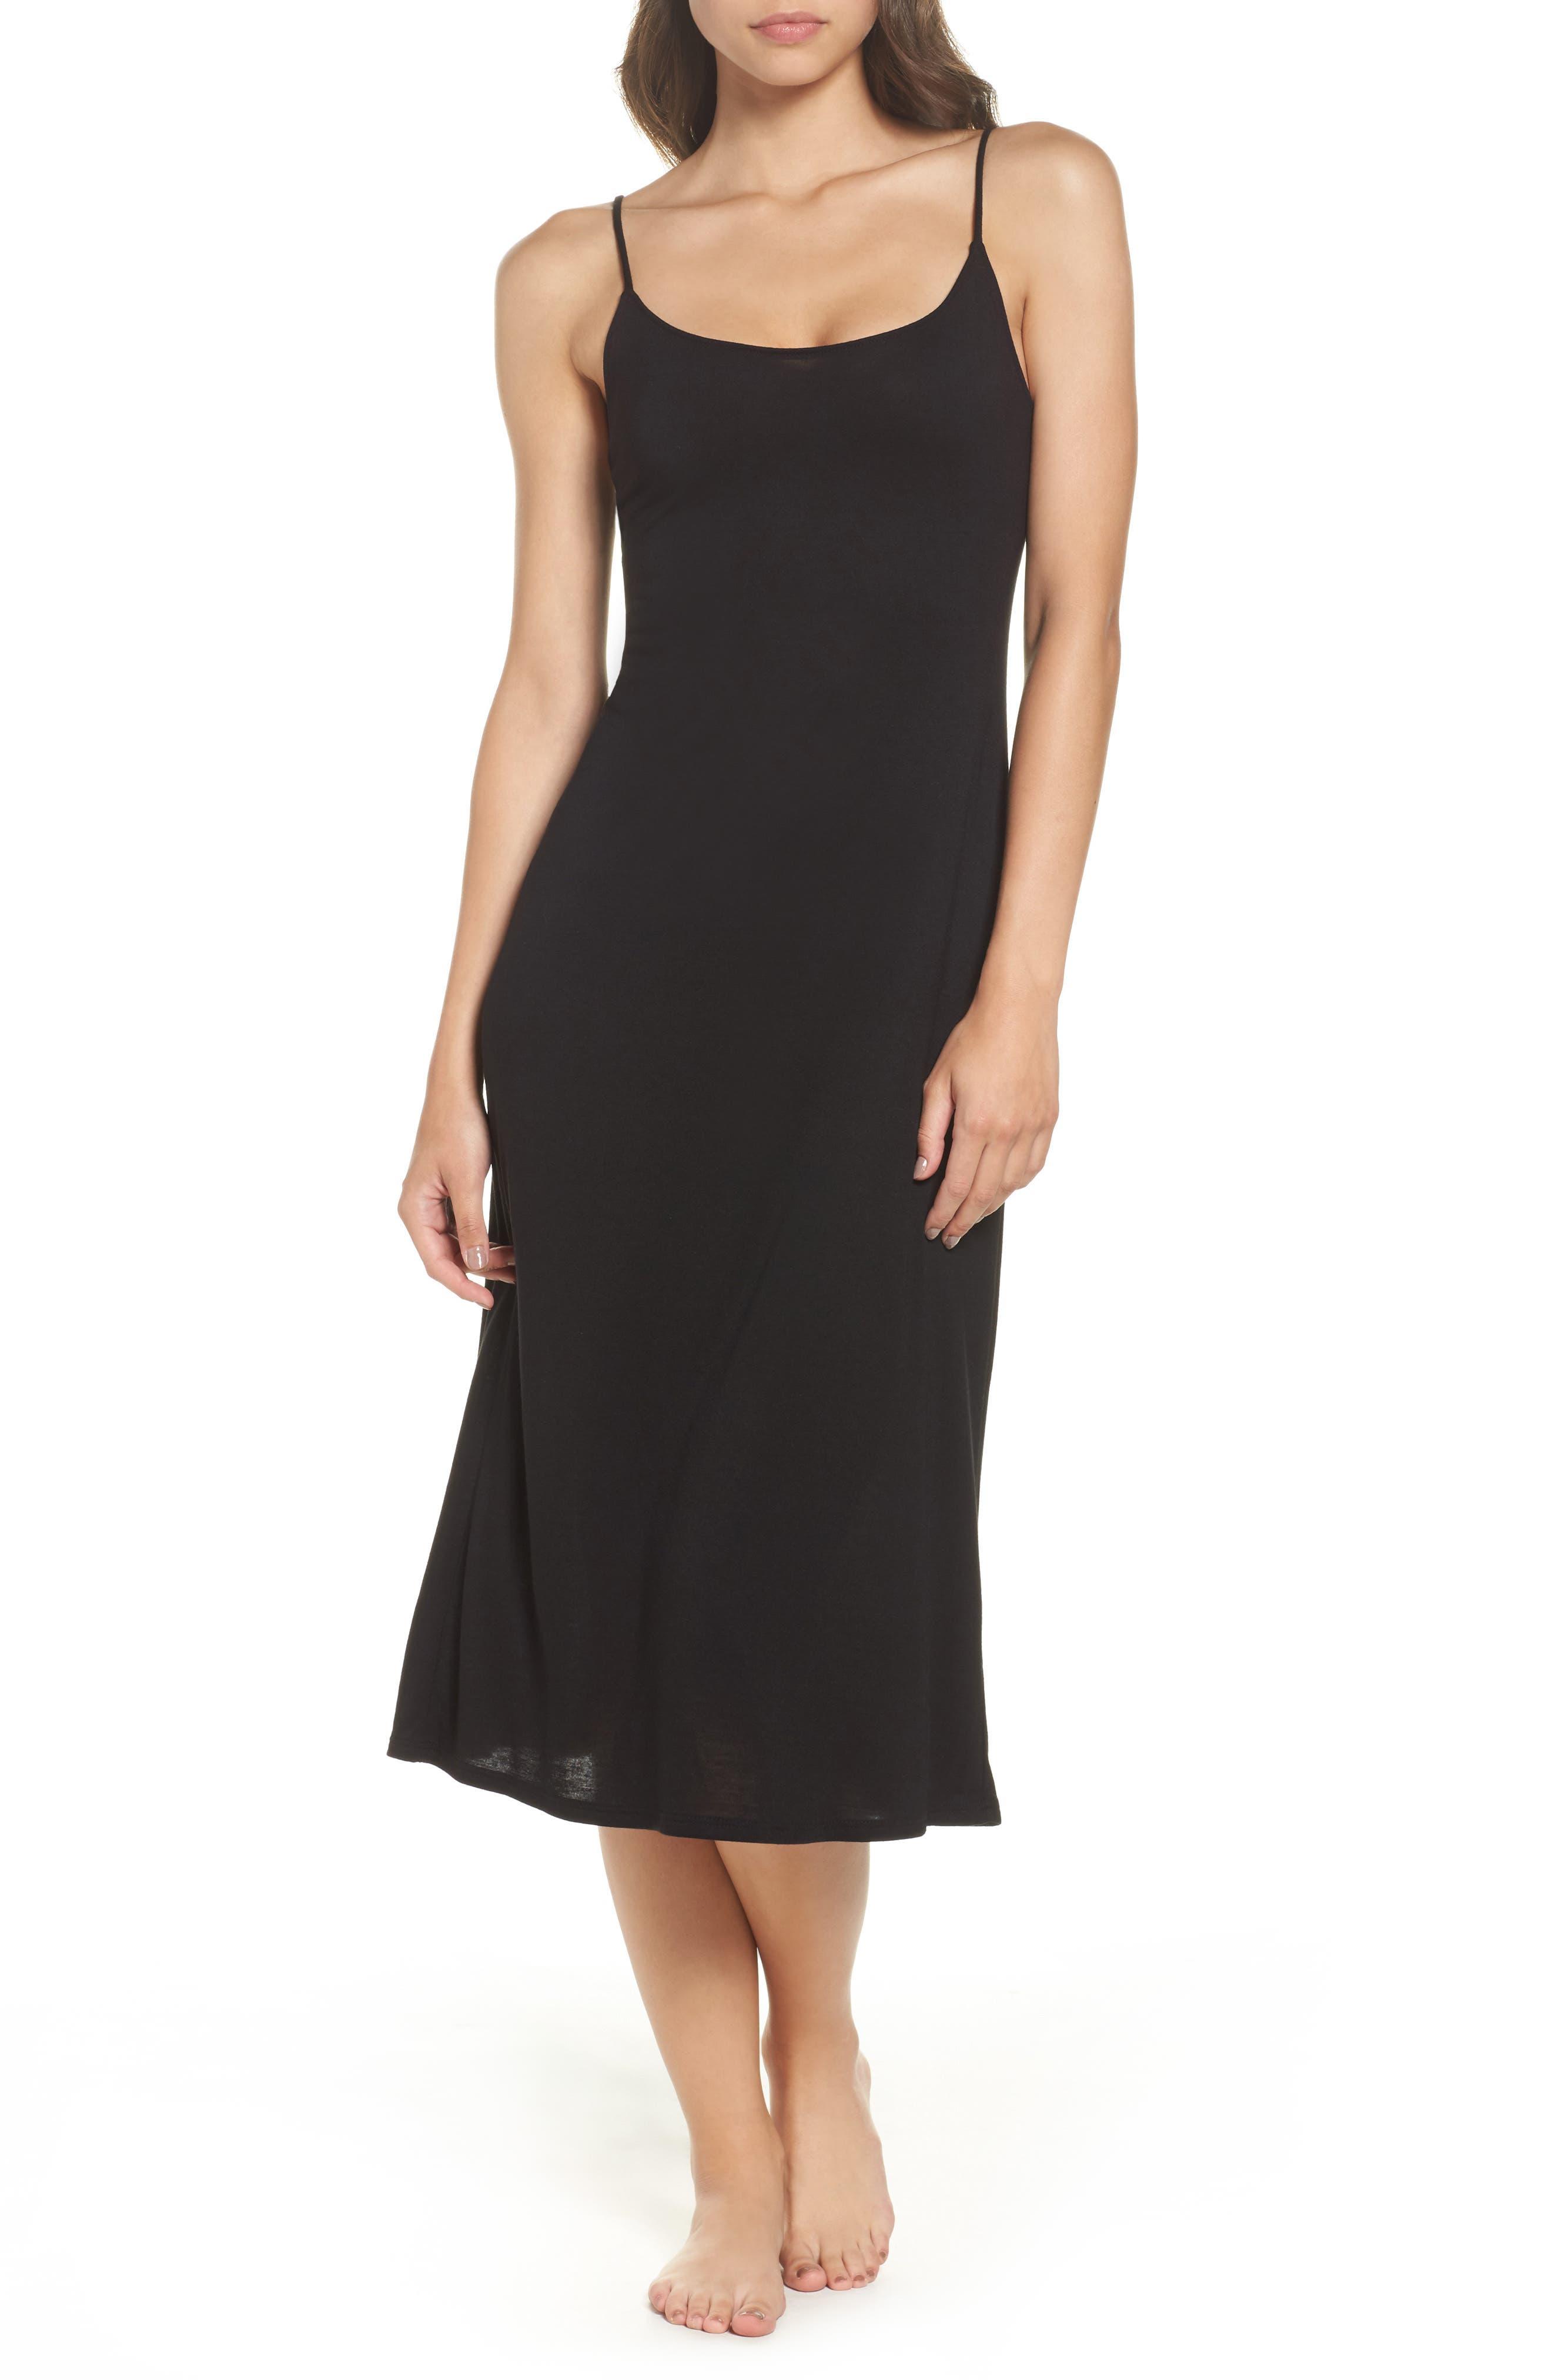 Natori Shangri La Nightgown, Black